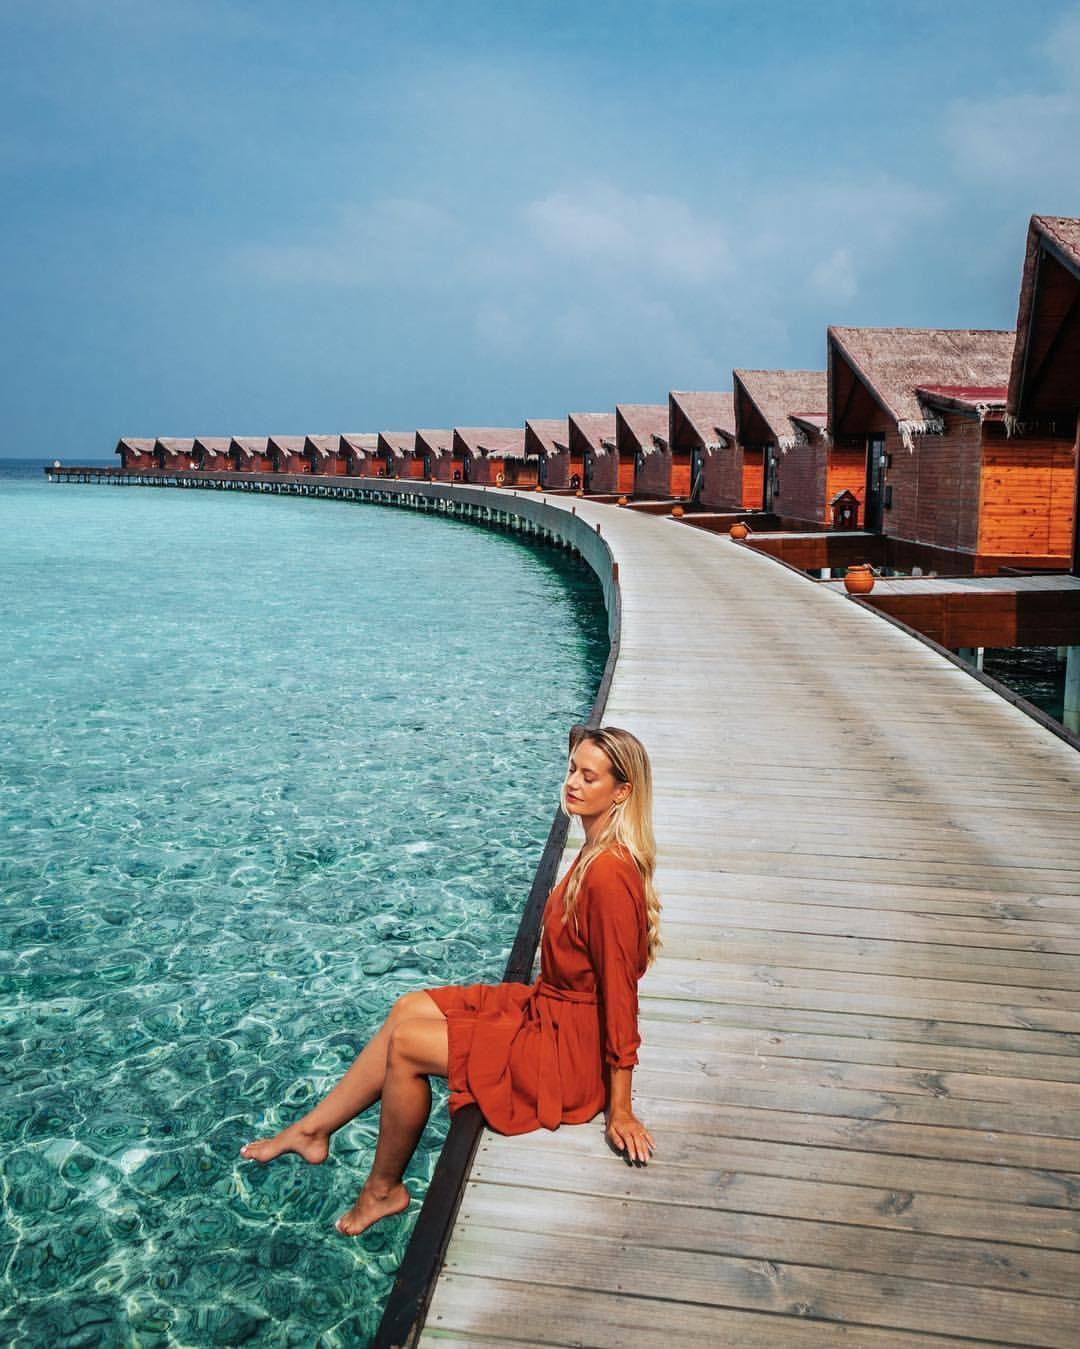 Travel Dreams By Sarah Braham On Bff Dream Trips Hols Vibes